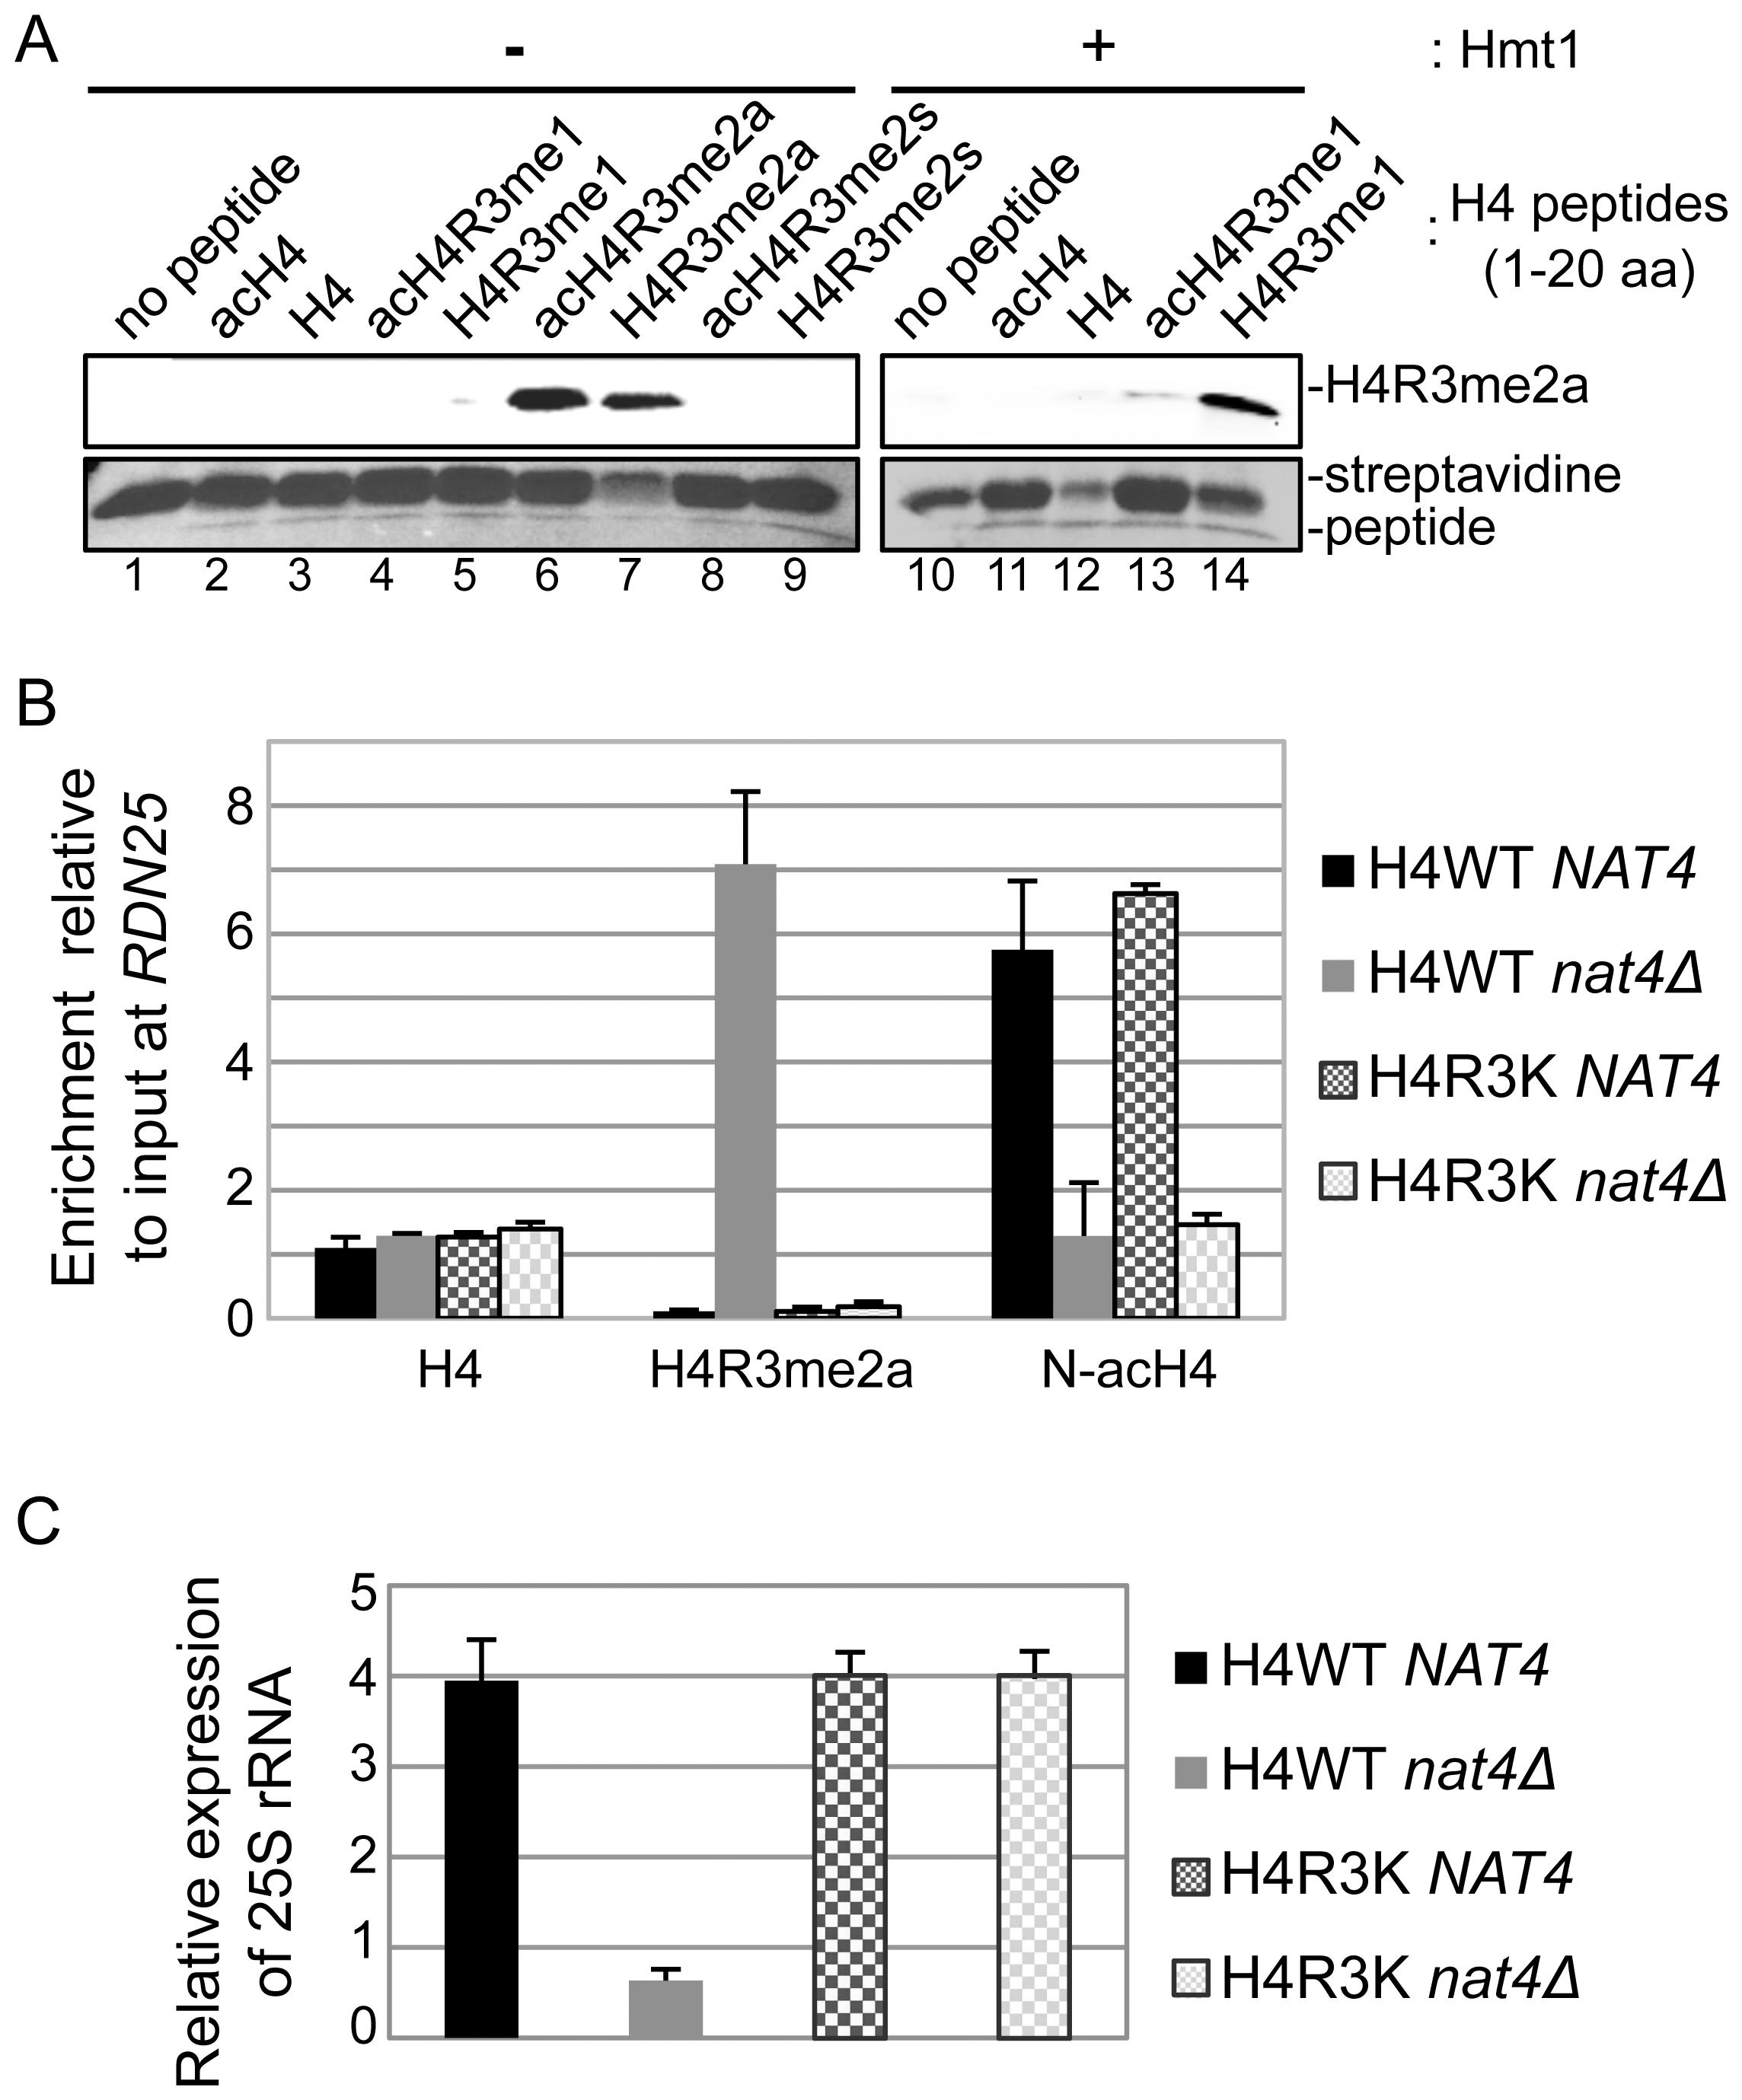 N-acH4 inhibits the Hmt1 methyltransferase activity towards H4R3.